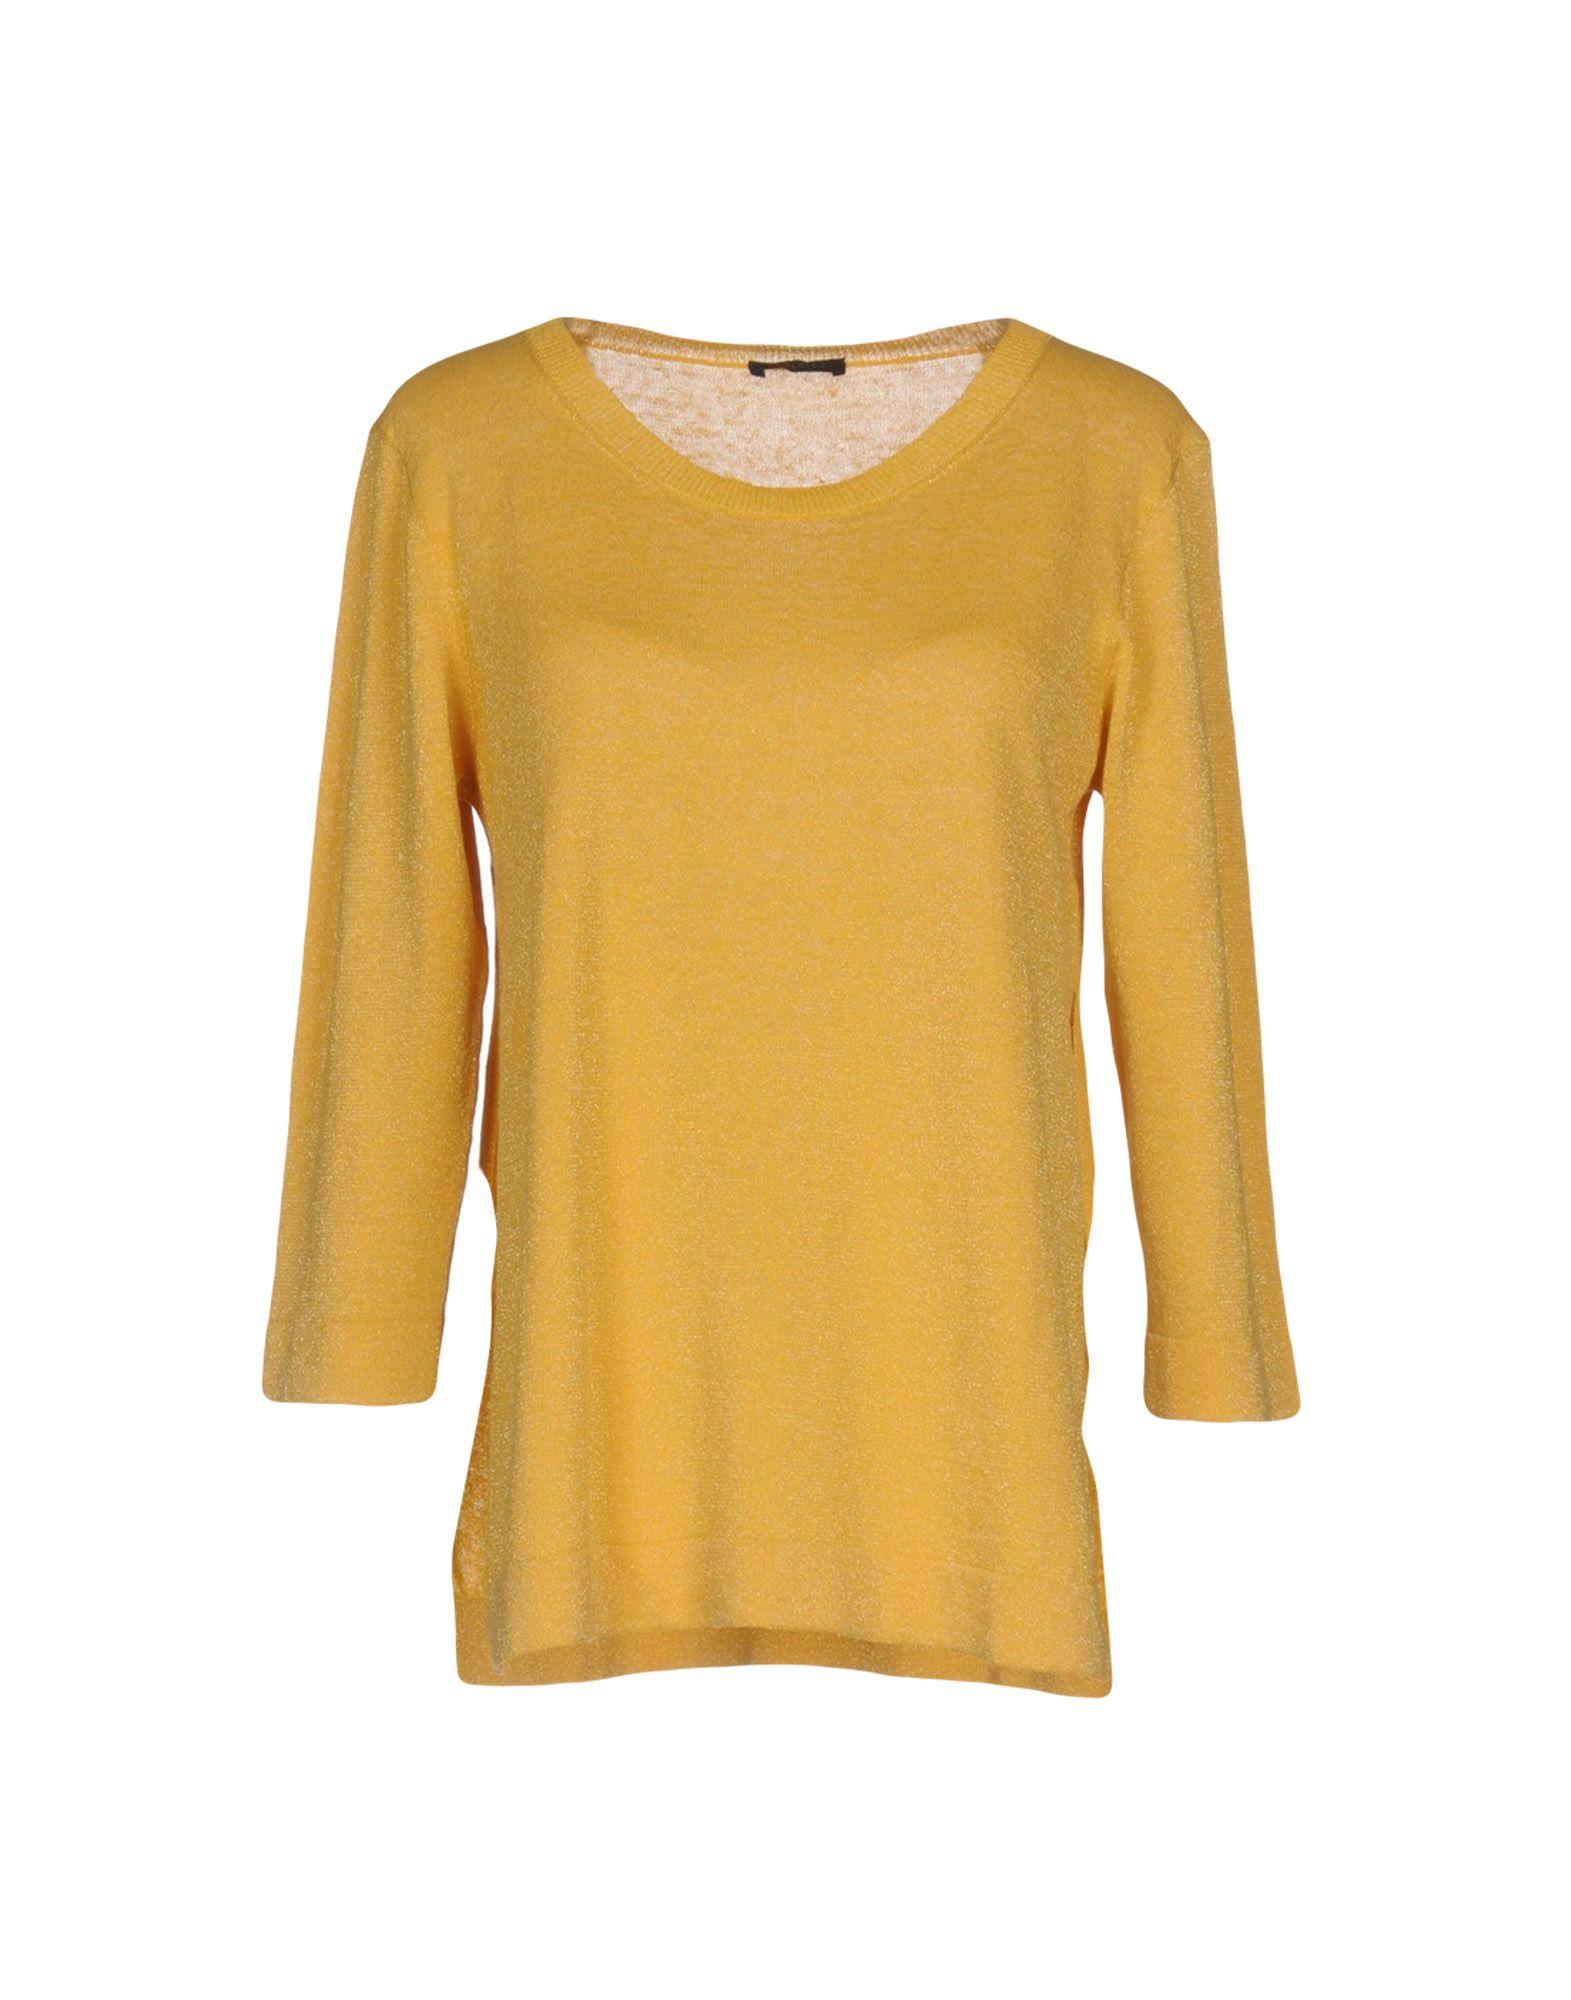 PESERICO Damen Pullover Farbe Gelb Größe 5